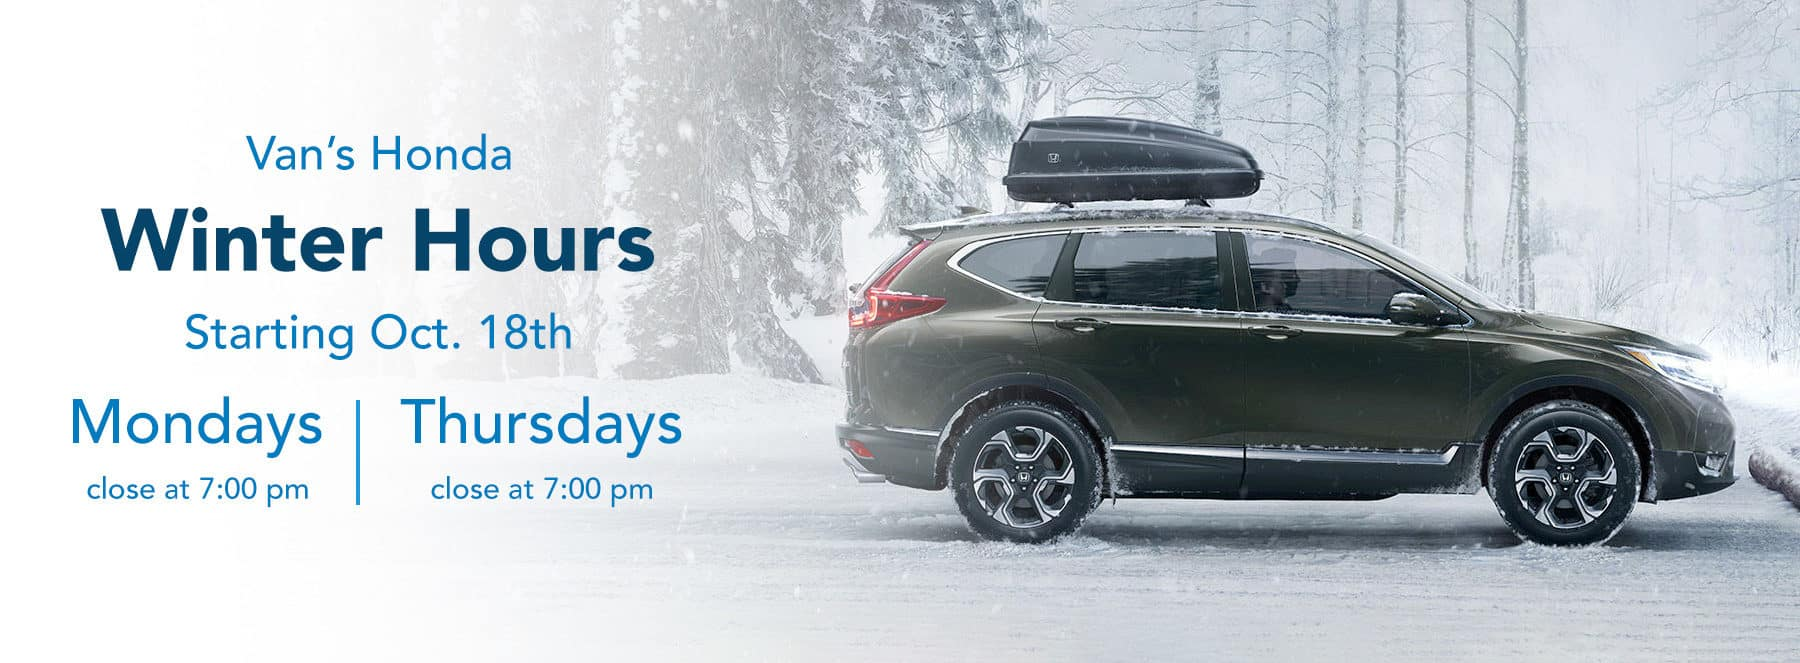 Starting Oct. 18th Van's Honda will close at 7:00 pm on Mondays and Thursdays.